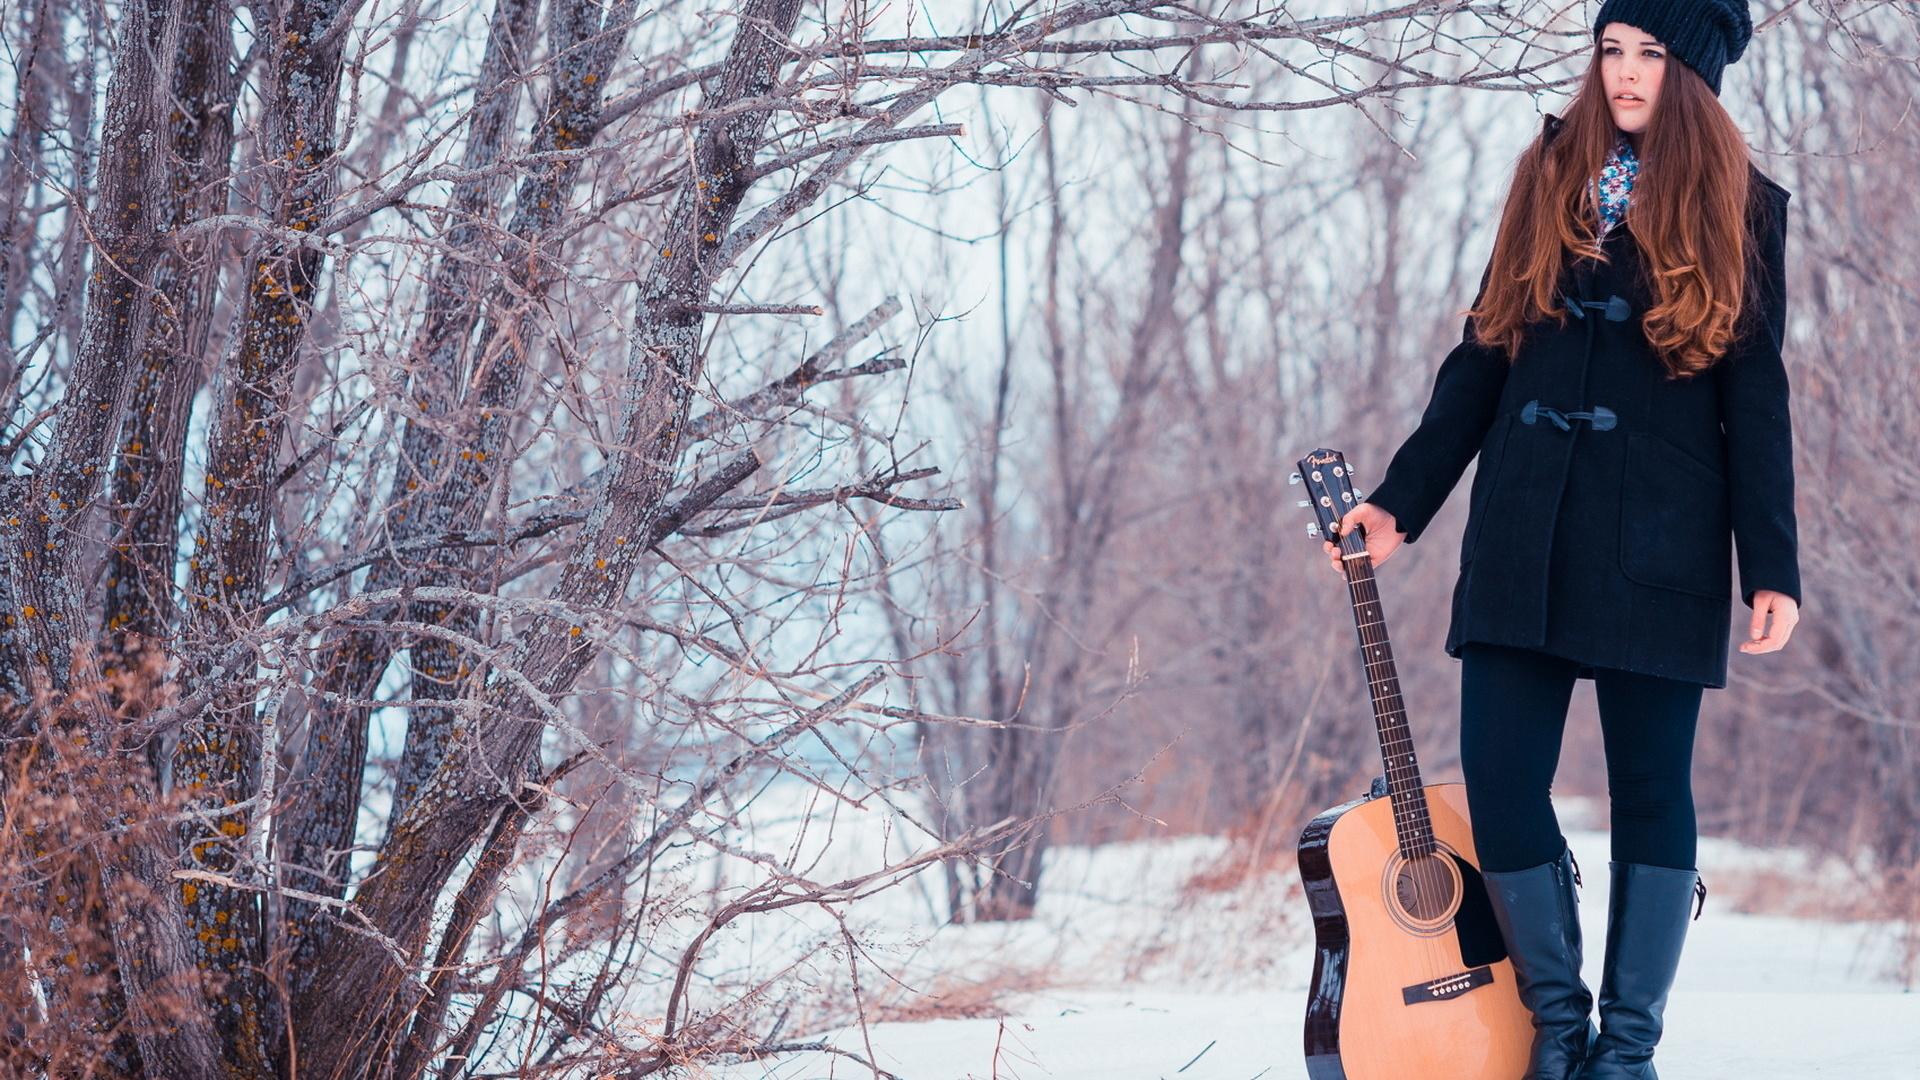 Girl, guitare, snow